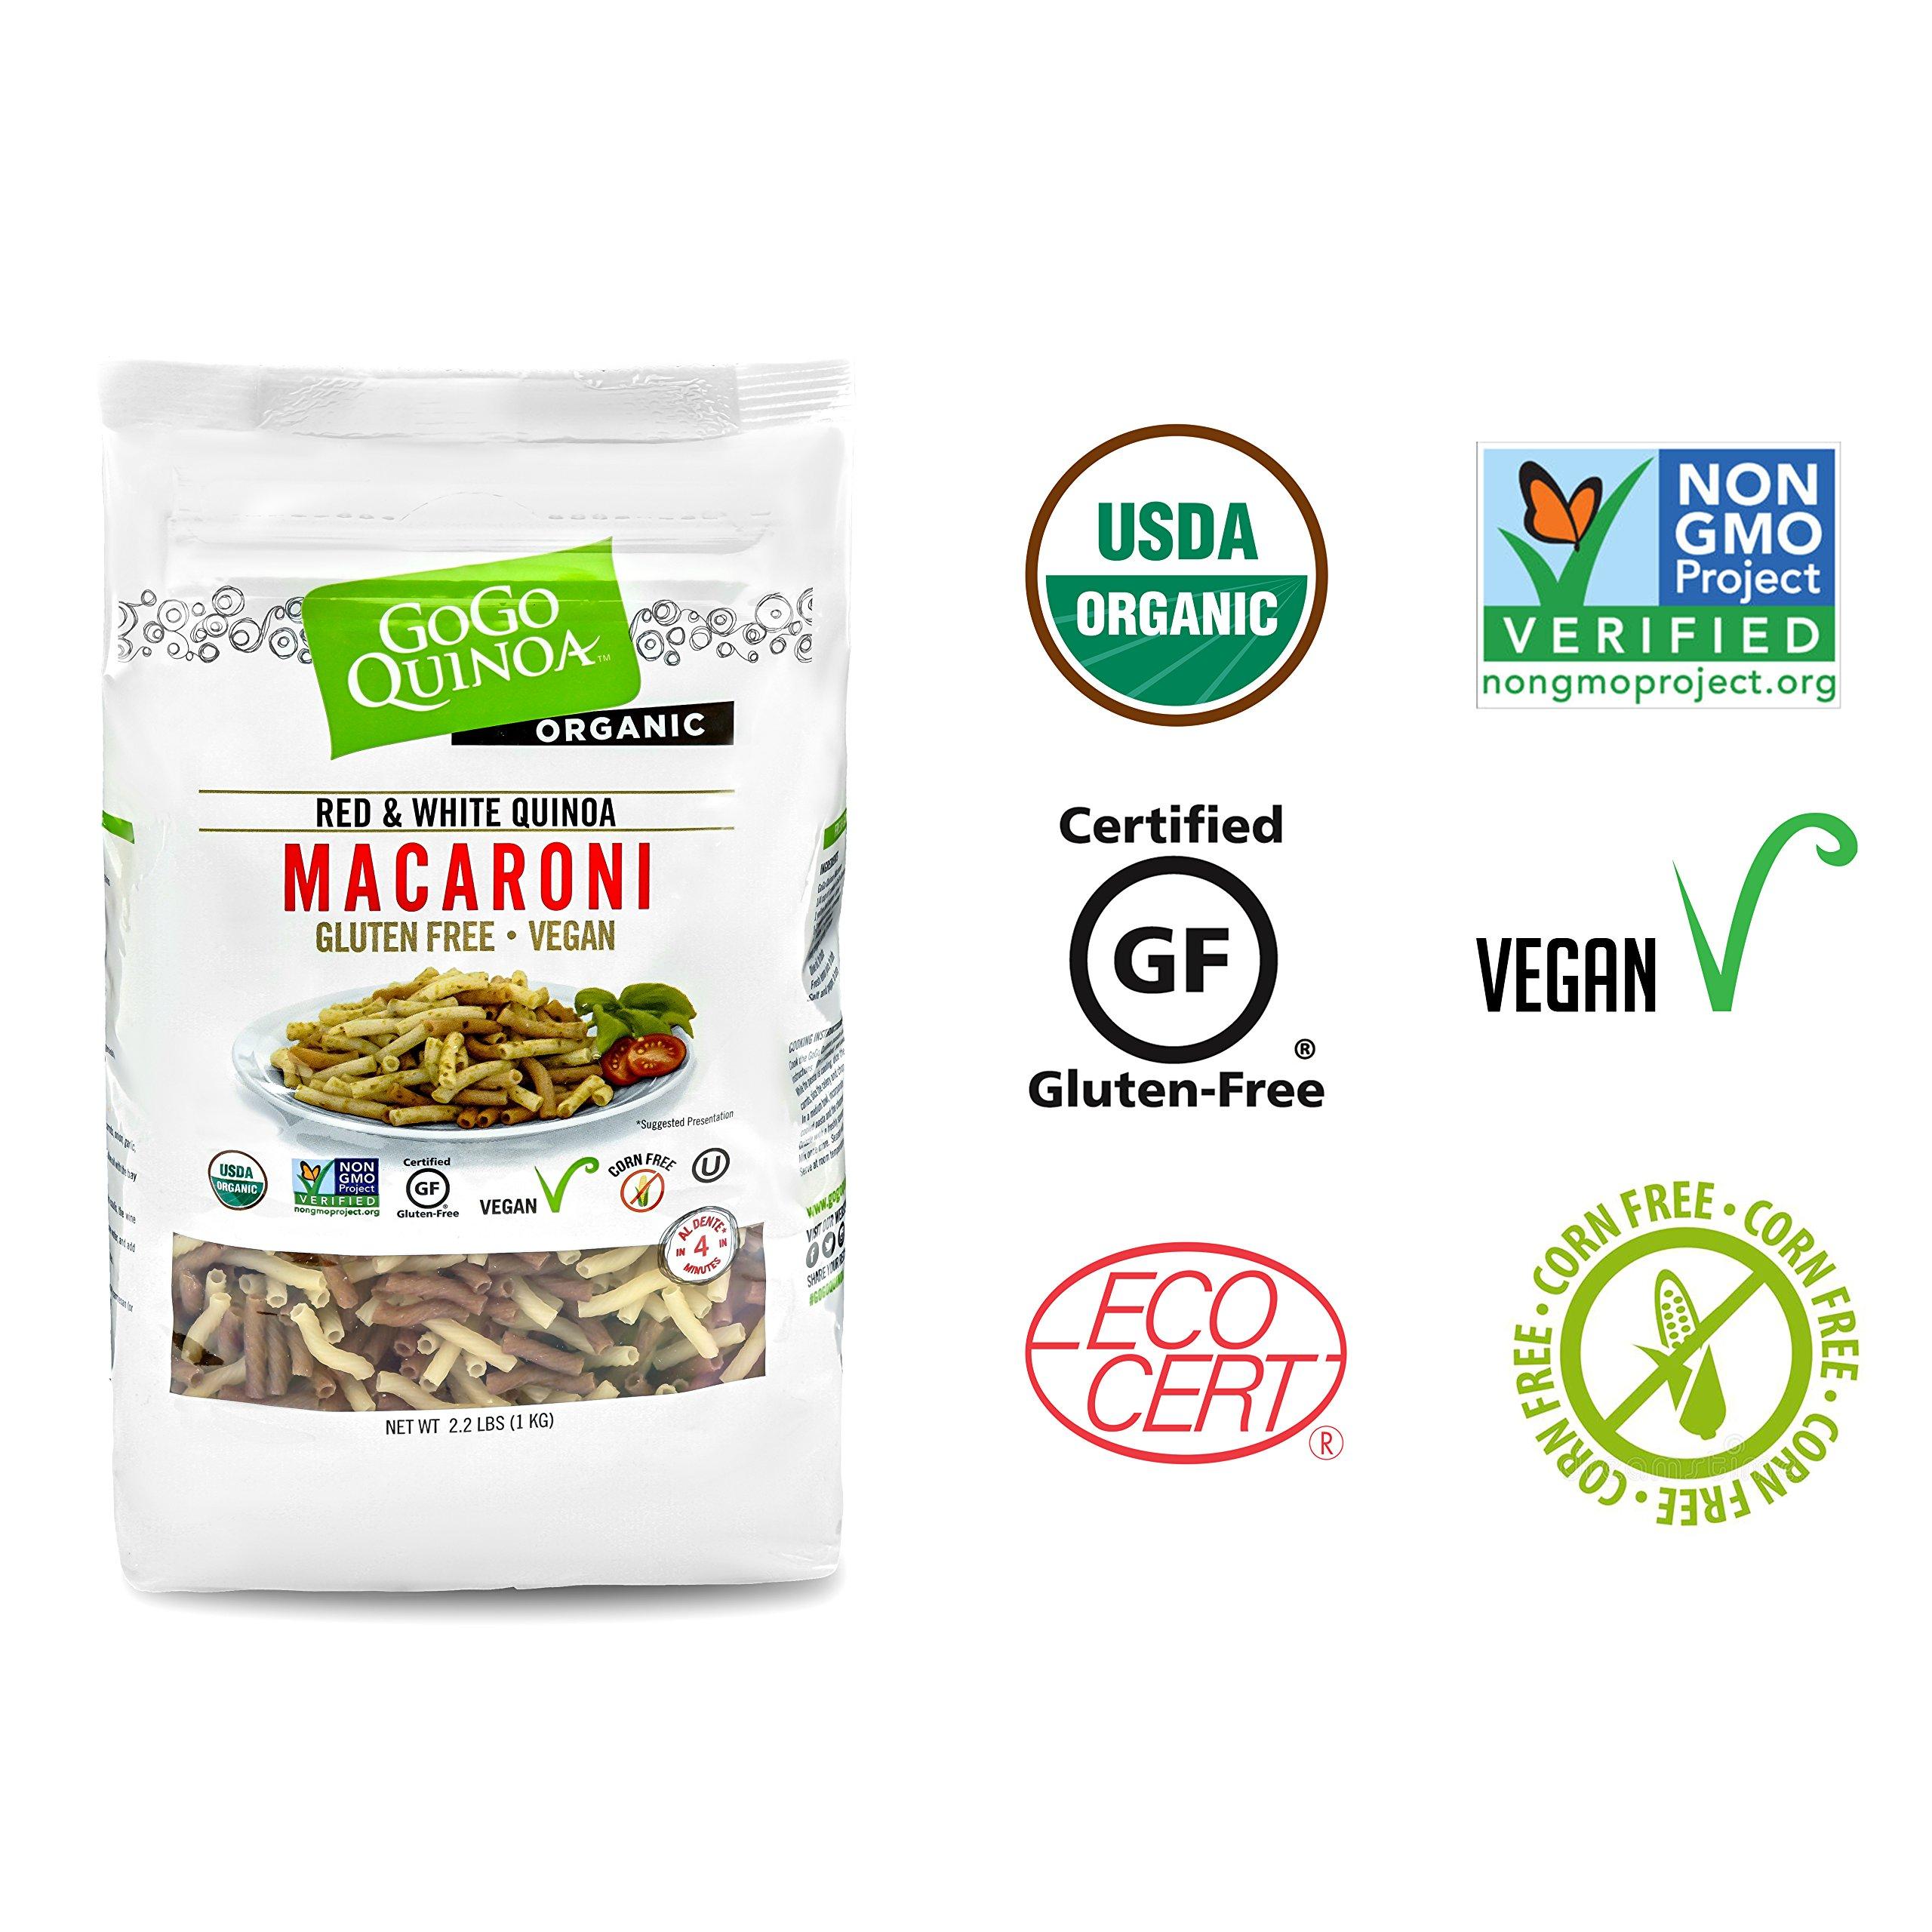 GoGo Quinoa Organic Premium Quality Vegan Red and White Macaroni Pasta, Non-GMO Project Verified & Kosher Certified 2.2 Lbs